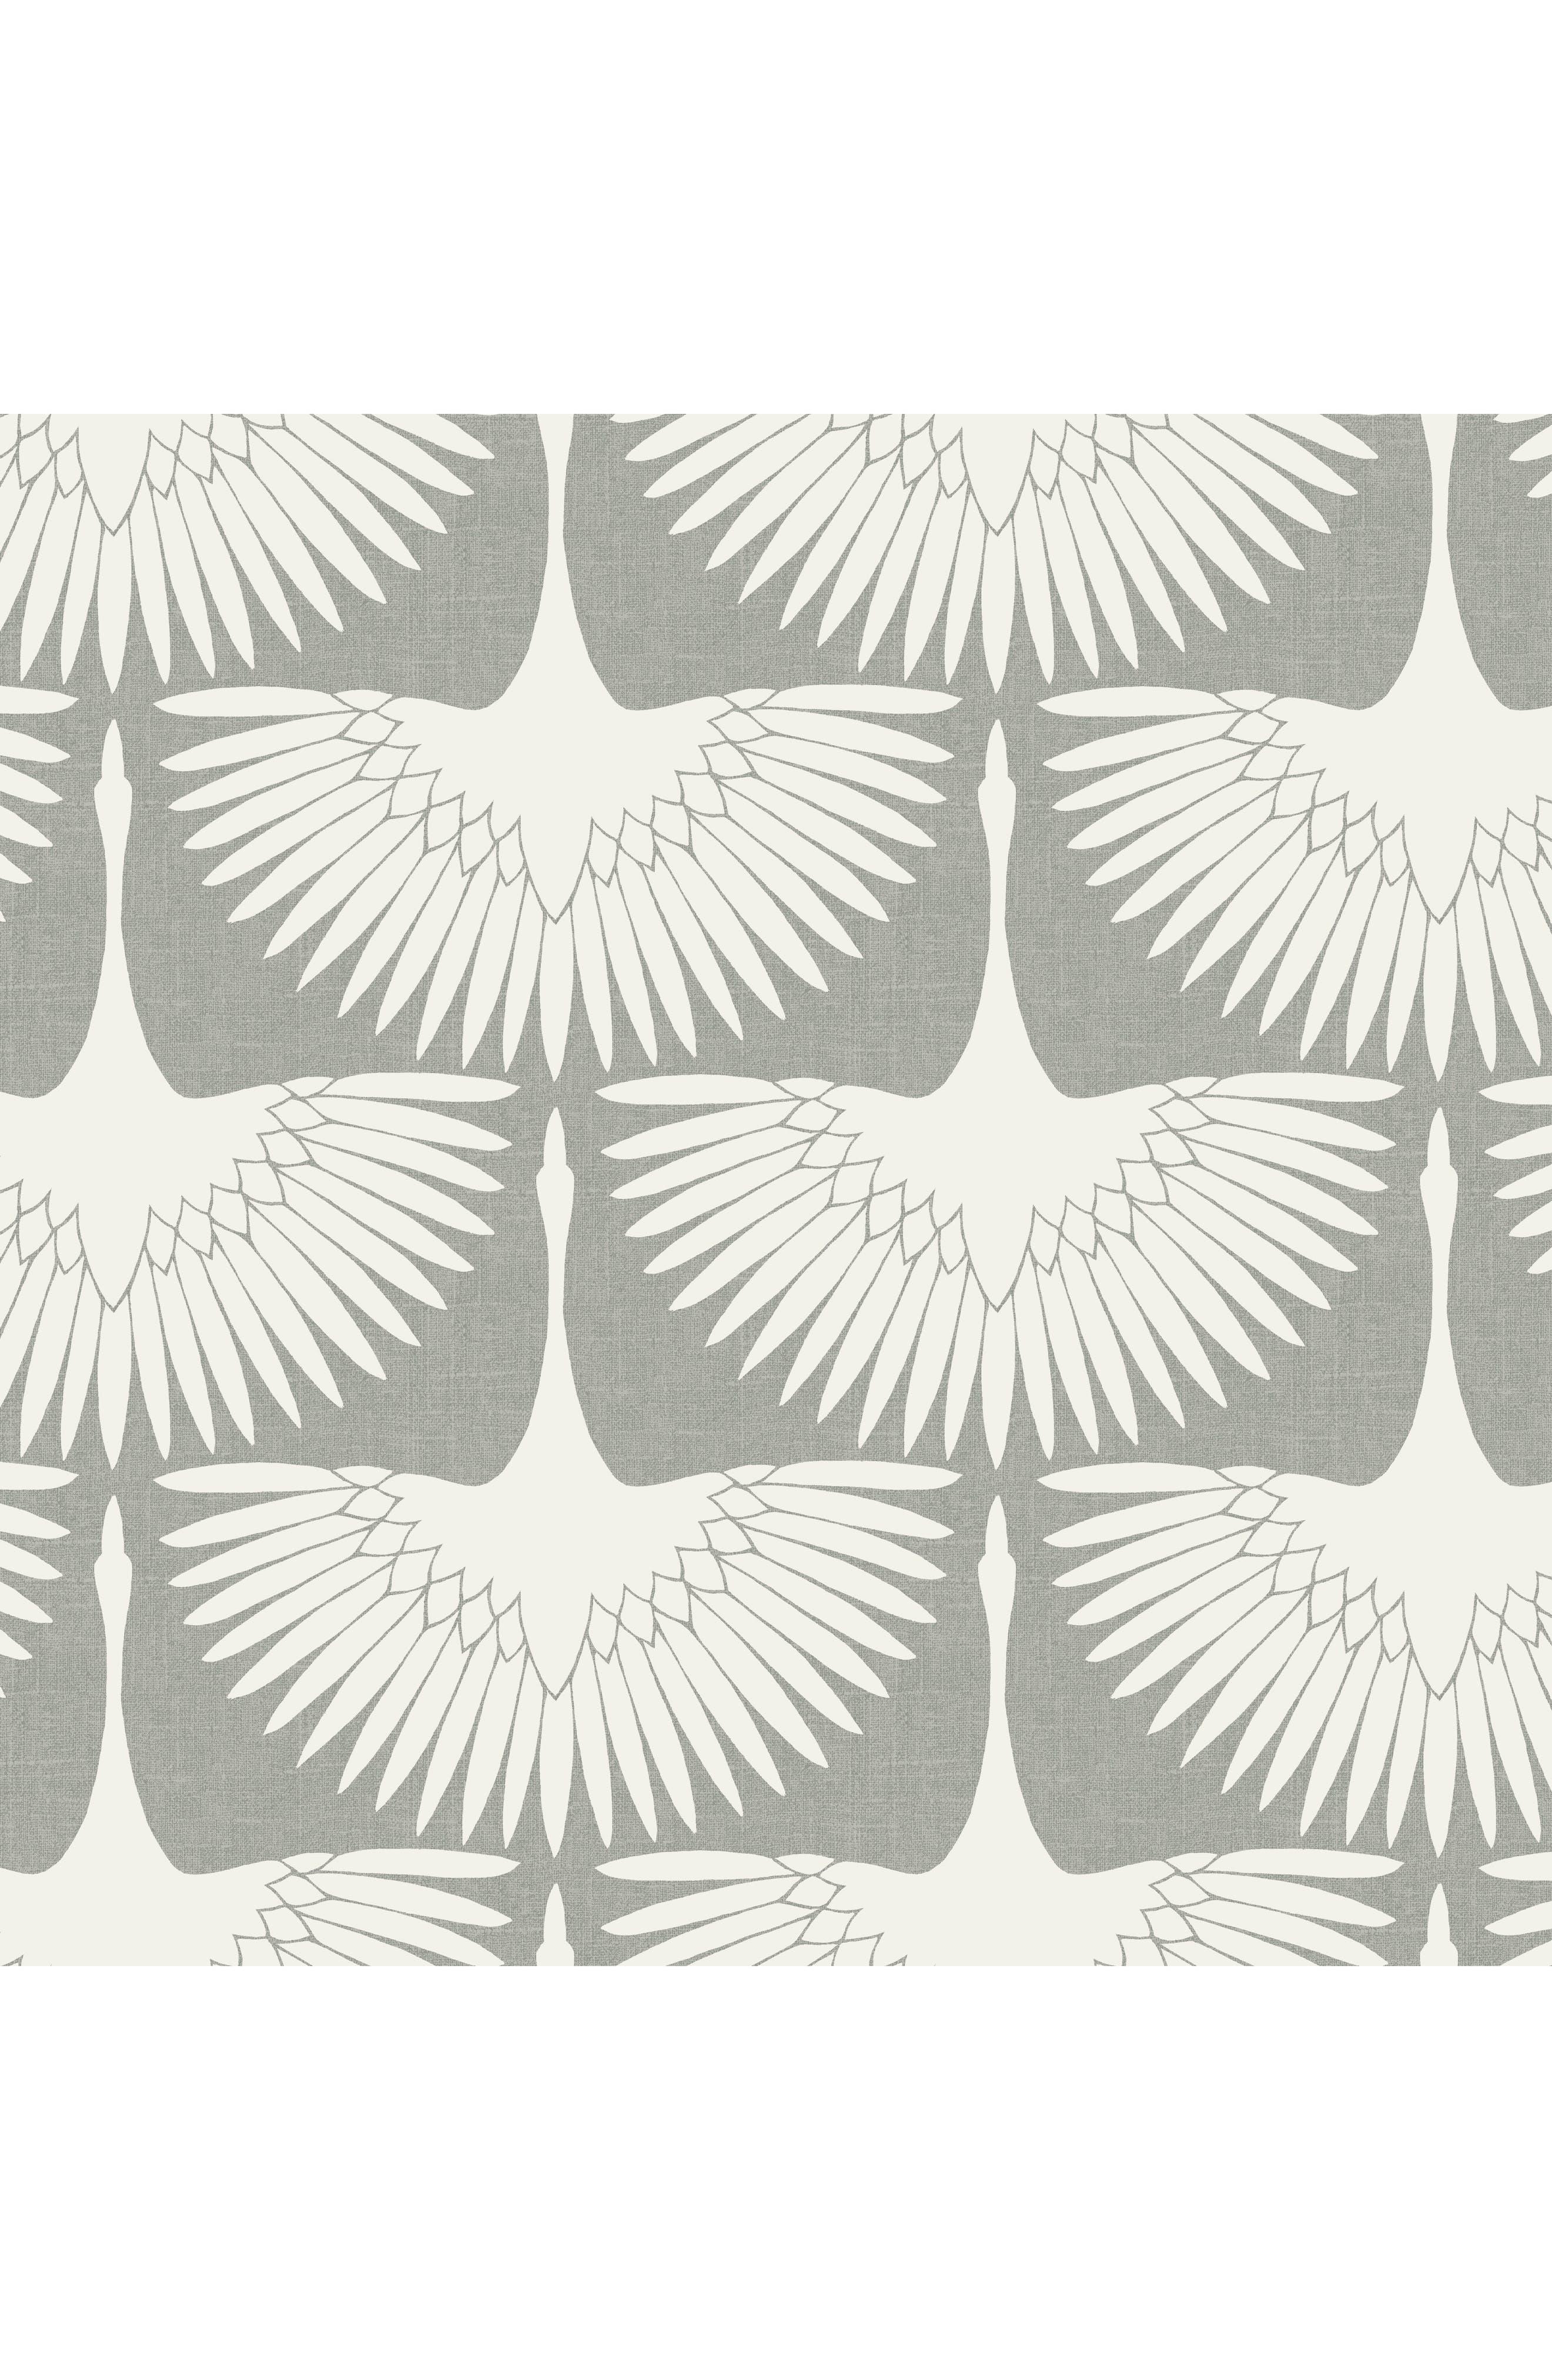 TEMPAPER,                             Feather Flock Vinyl Wallpaper,                             Main thumbnail 1, color,                             900